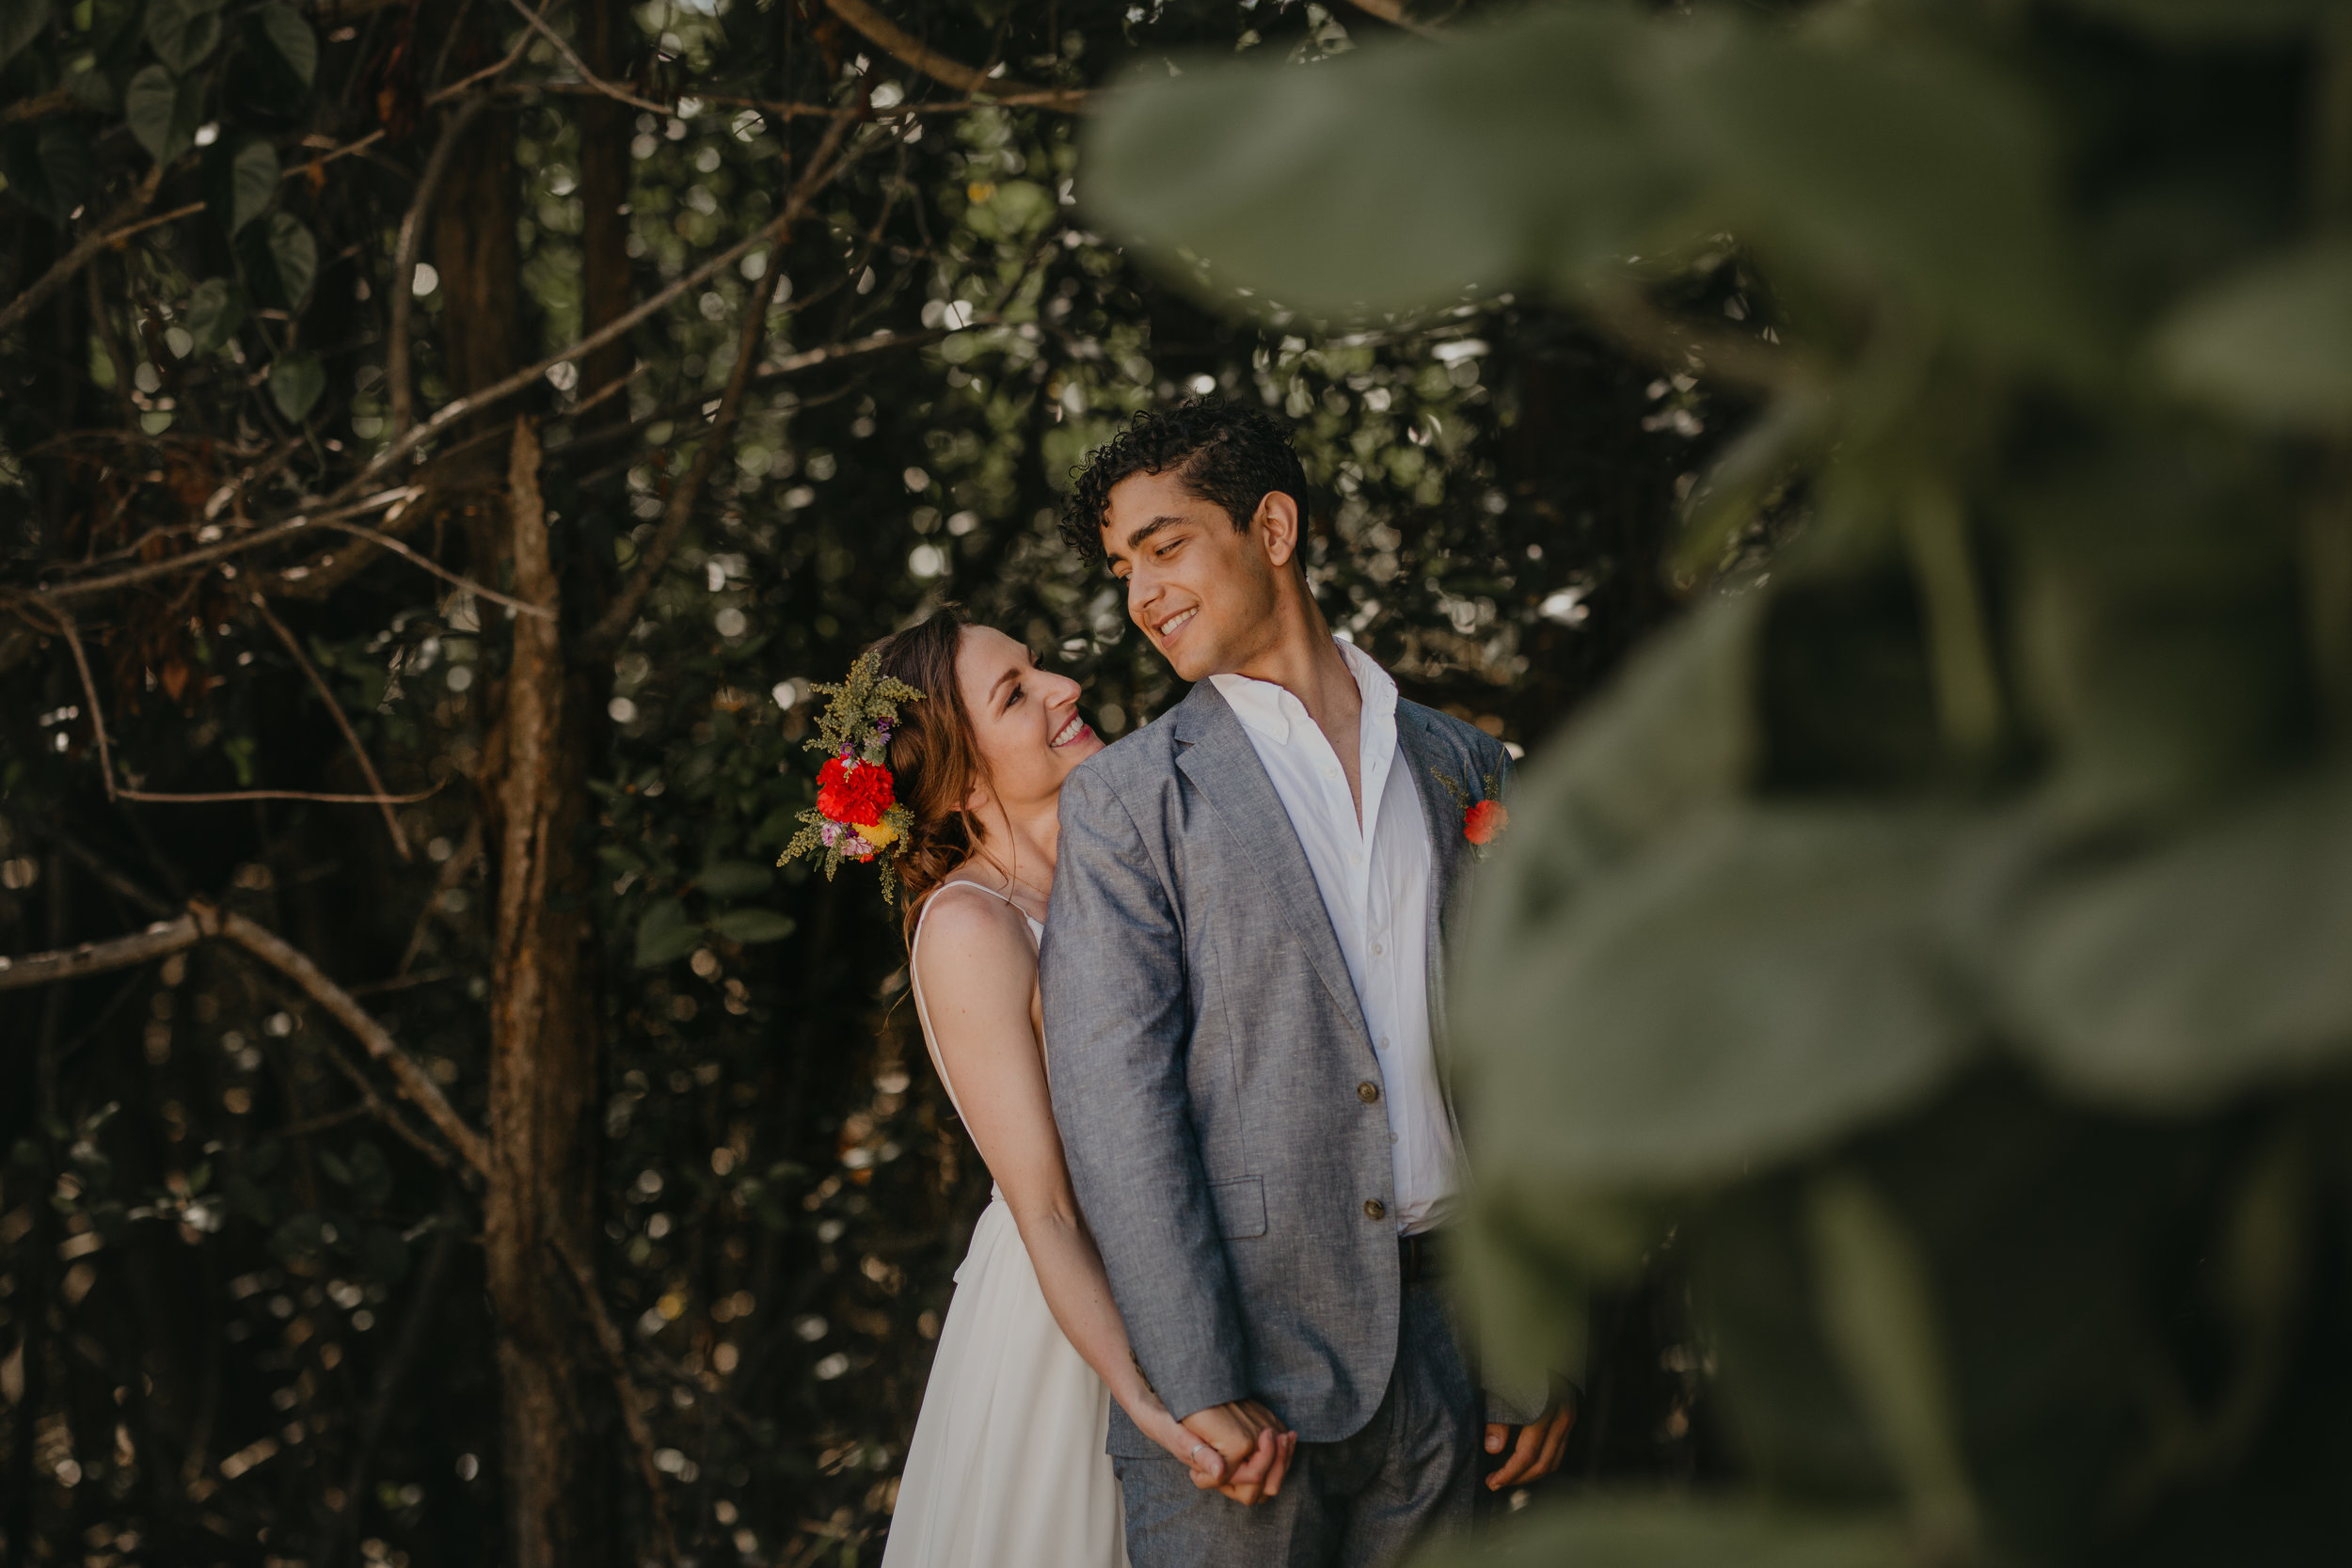 Nicole-Daacke-Photography-beachfront-akumal-destionation-wedding-tulum-mexico-elopement-photographer-destination-wedding-inspiration-sunset-champagne-pop-boho-bride-ocean-tropical-bohemian-tulum-wedding-photos-125.jpg